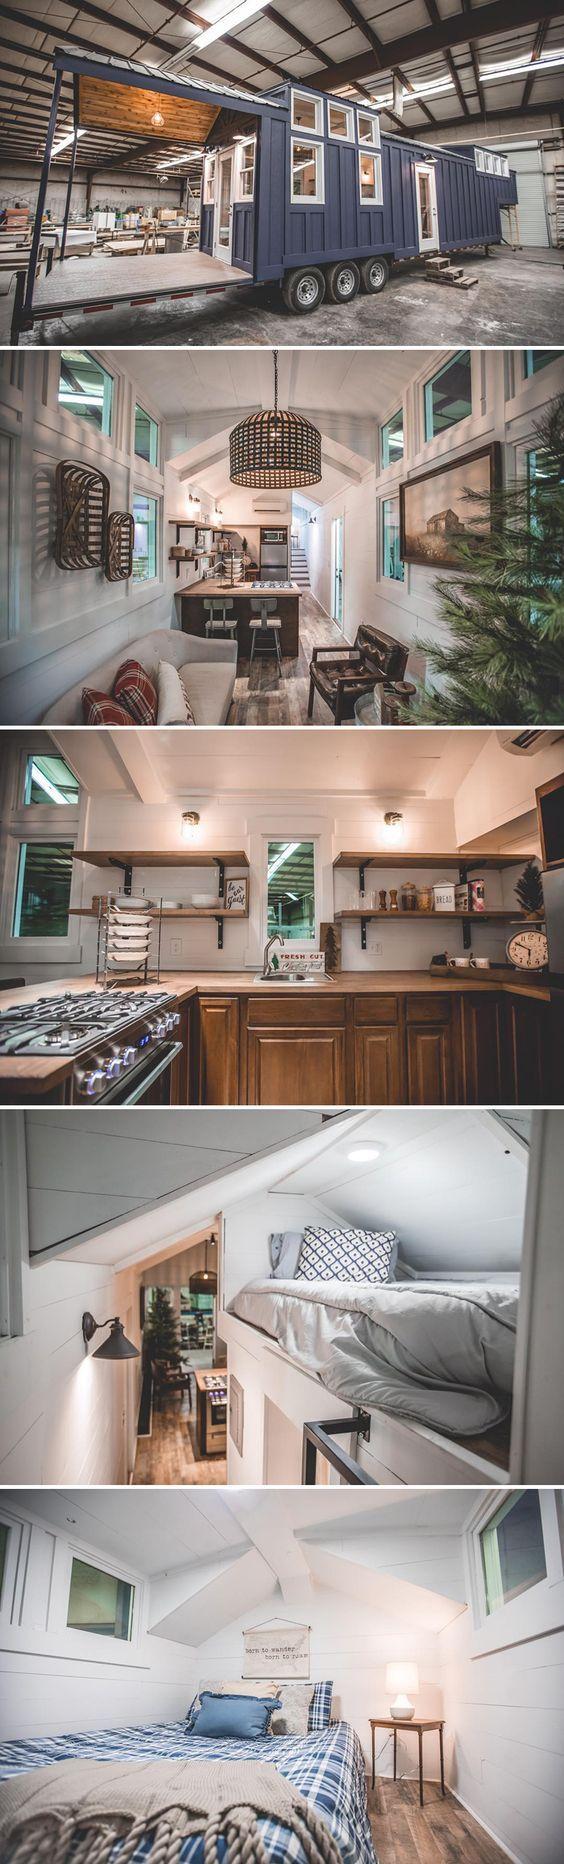 1074 best Tiny house images on Pinterest